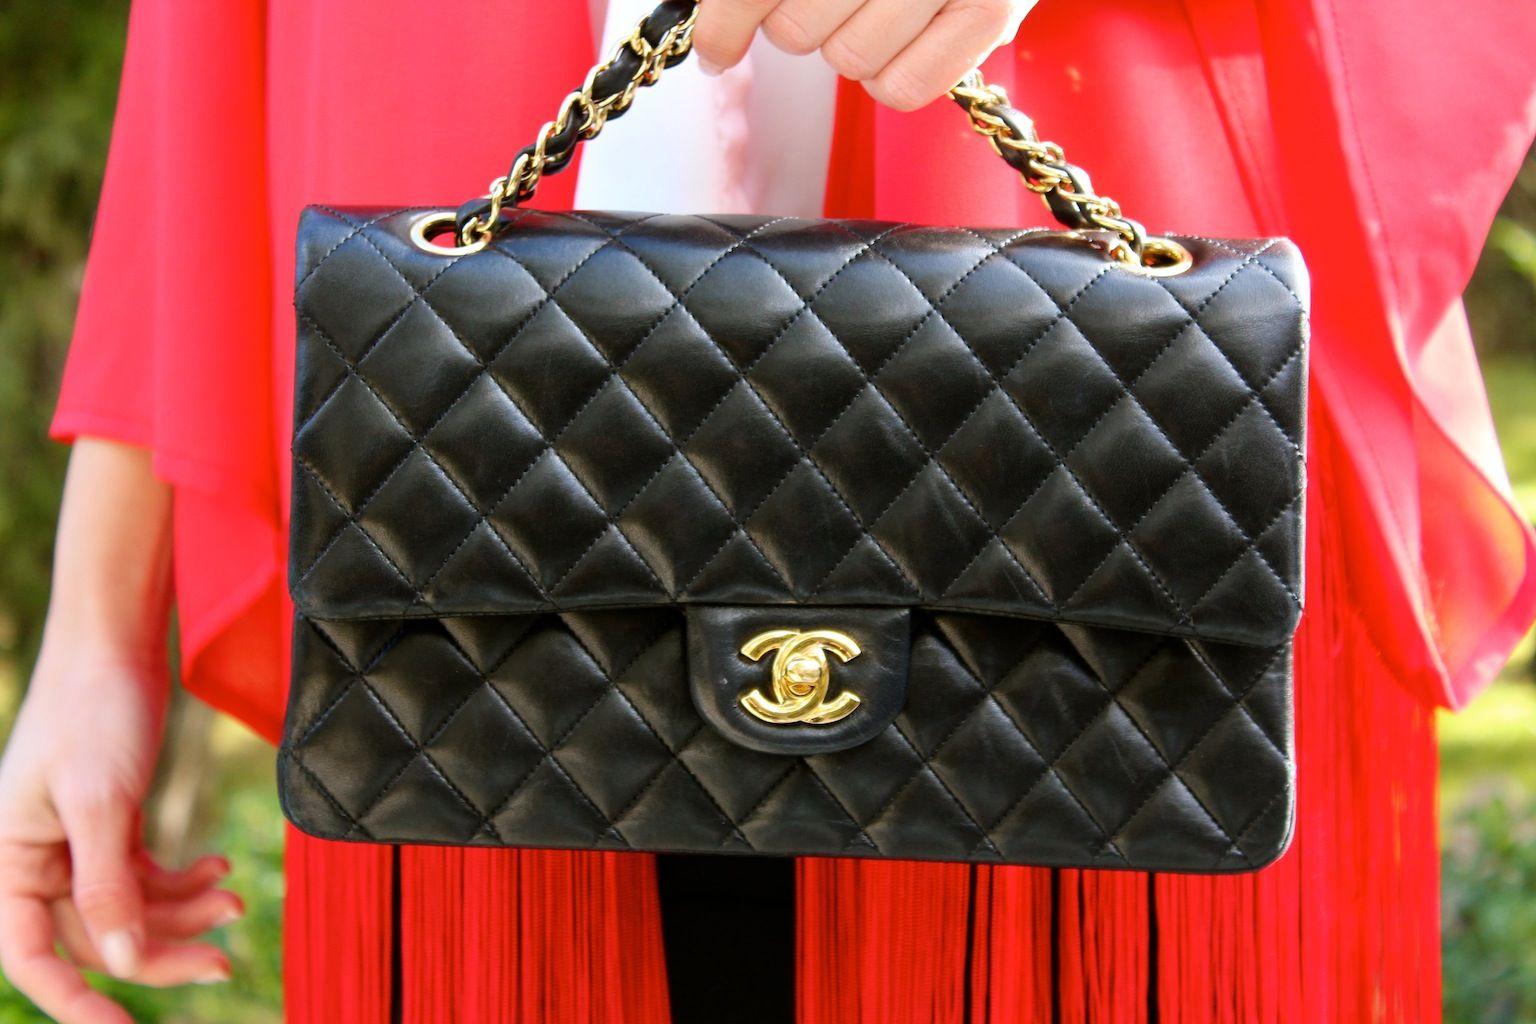 Fashion and Style Blog / Blog de Moda . Post: Sales : Fringes are back! / Vuelven los flecos! .More pictures on/ Más fotos en : http://www.ohmylooks.com/?p=26340 .Llevo/I wear: Jacket / Chaqueta de flecos : Oh My Looks Shop (info@ohmylooks.com) ; Blouse/Blusa  Zara (old) ; Skirt/Falda : Mango (old) ; Bag/Bolso : Chanel ; Shoes / Zapatos : Pilar Burgos